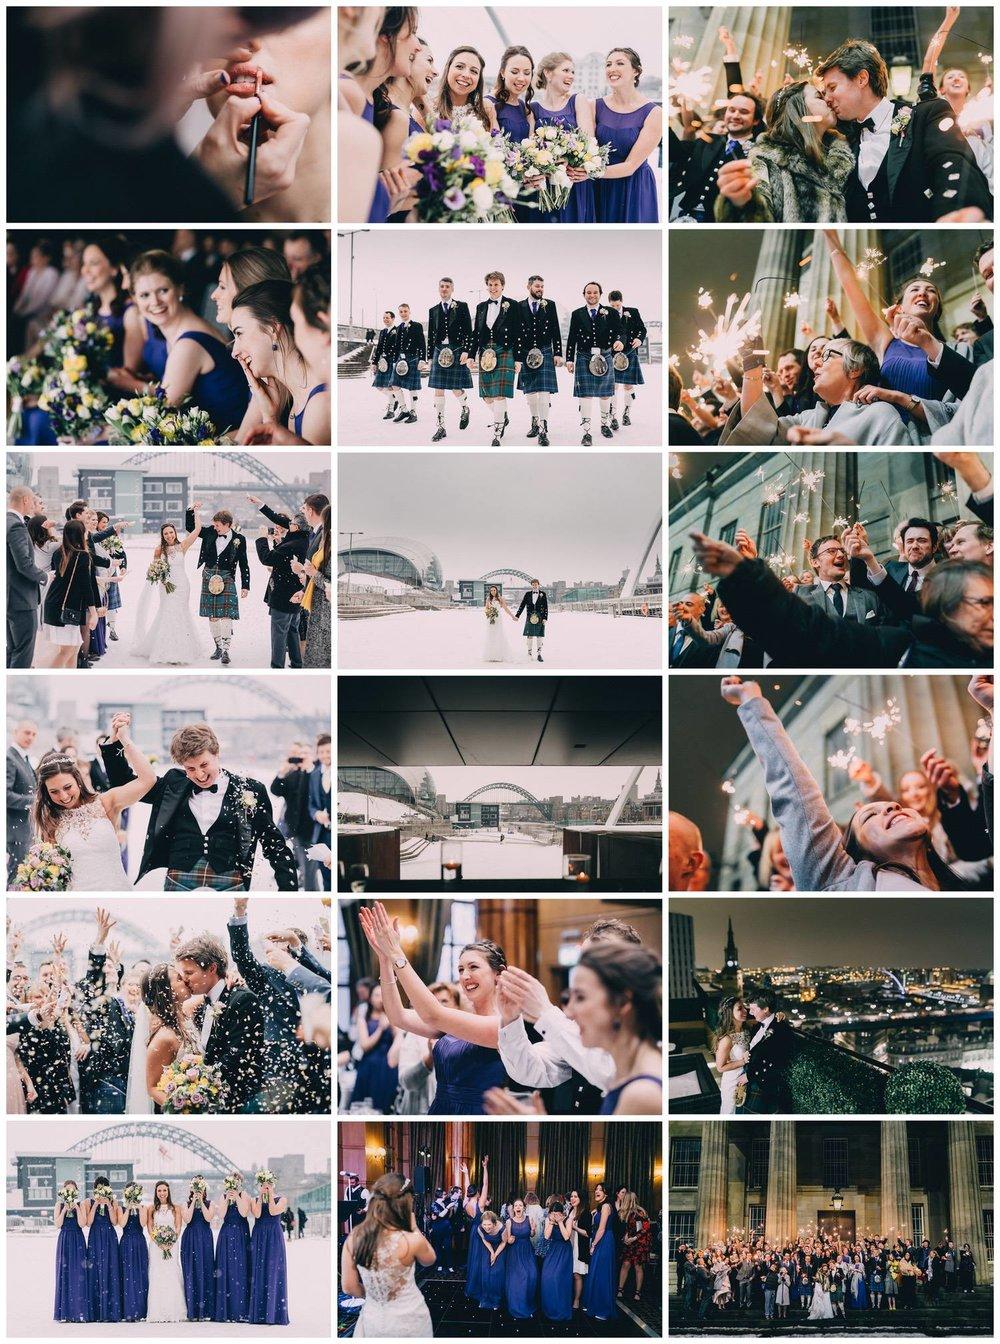 The+Baltic+Wedding+Videographer.jpg